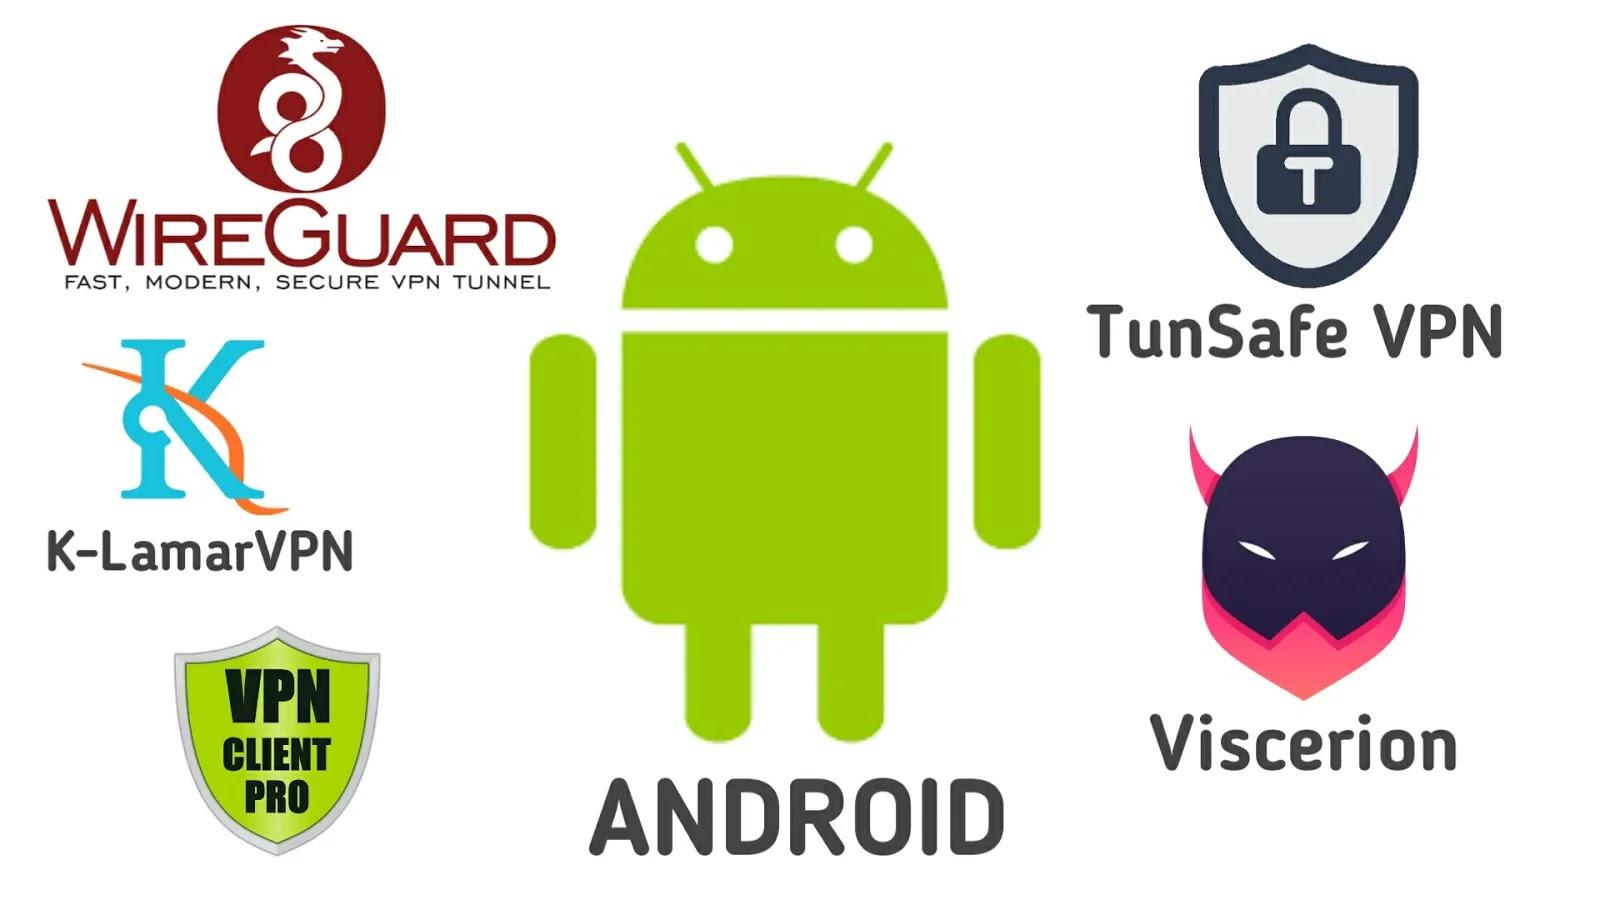 5 Aplikasi WireGuard yang Wajib Kamu Coba di Ponsel Android